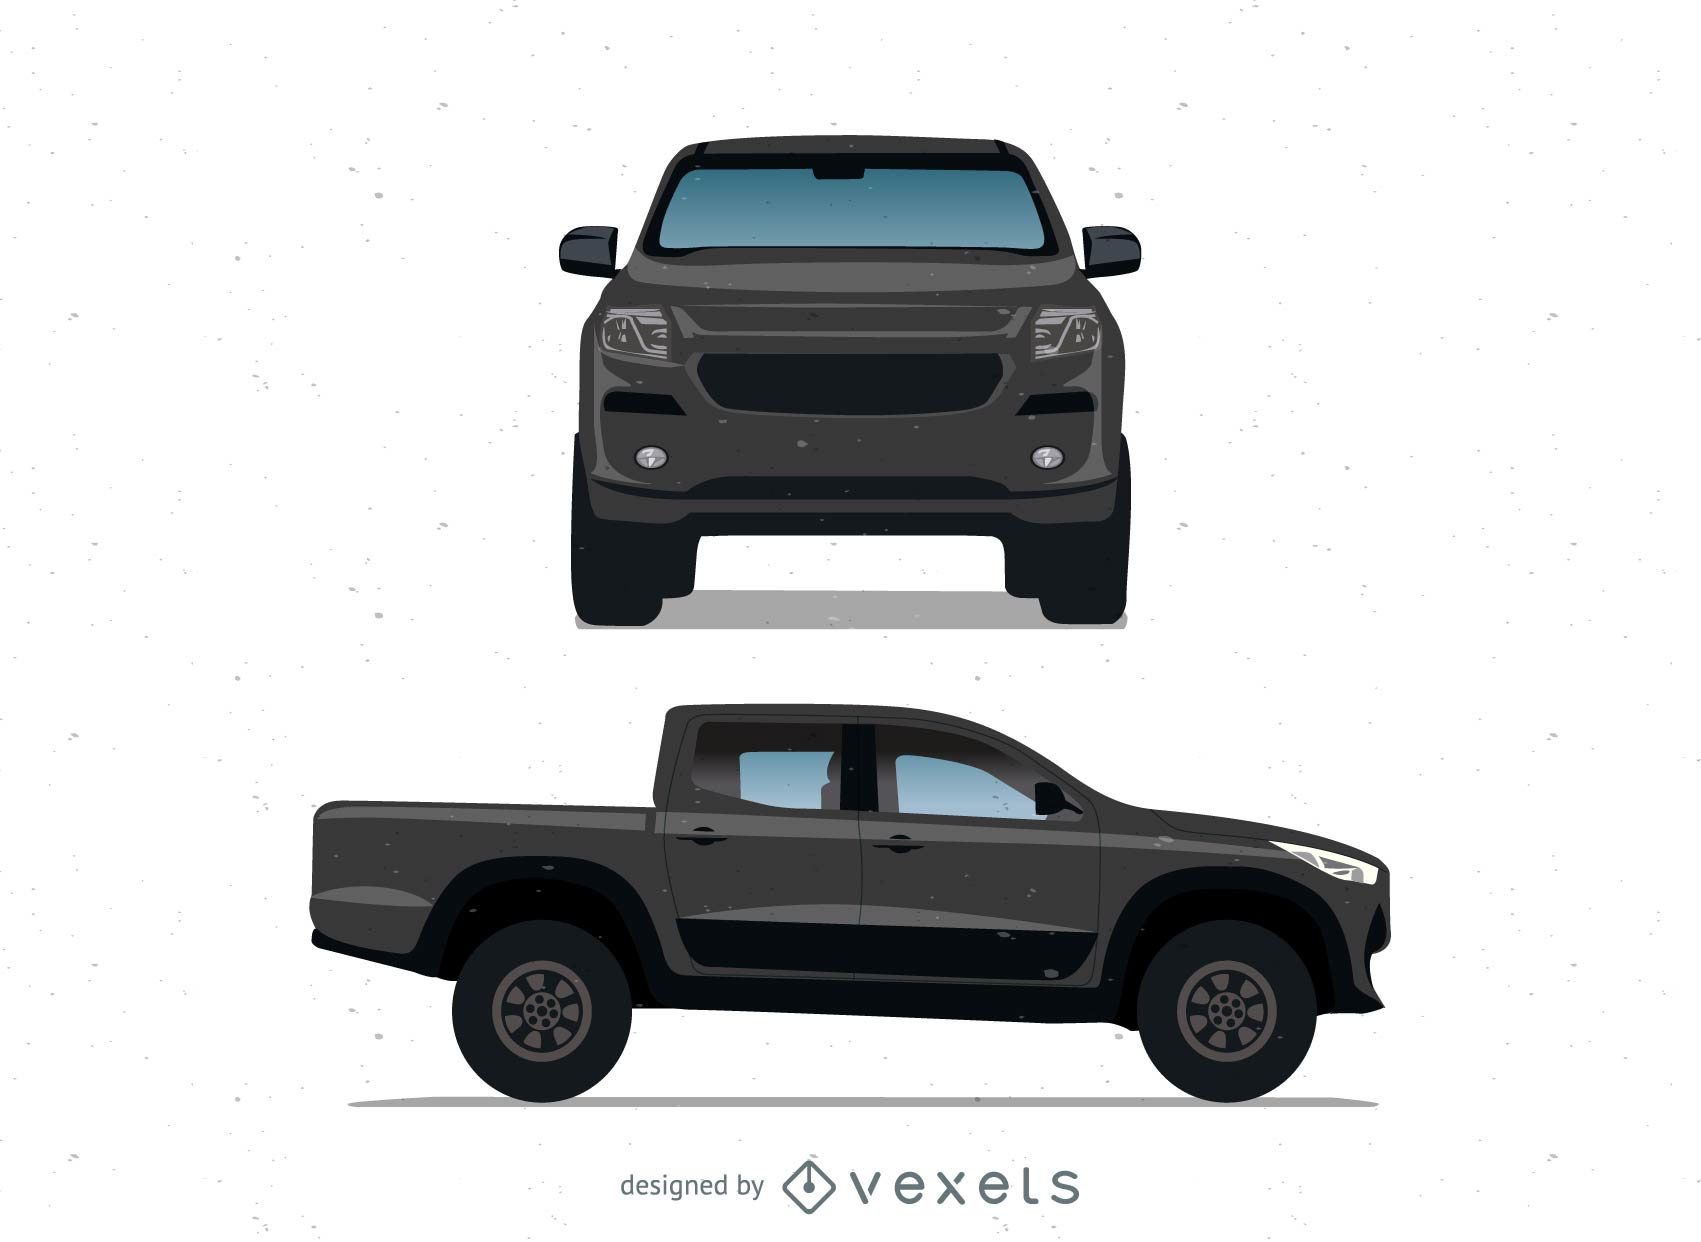 Ford Realistic Black Pickup Truck